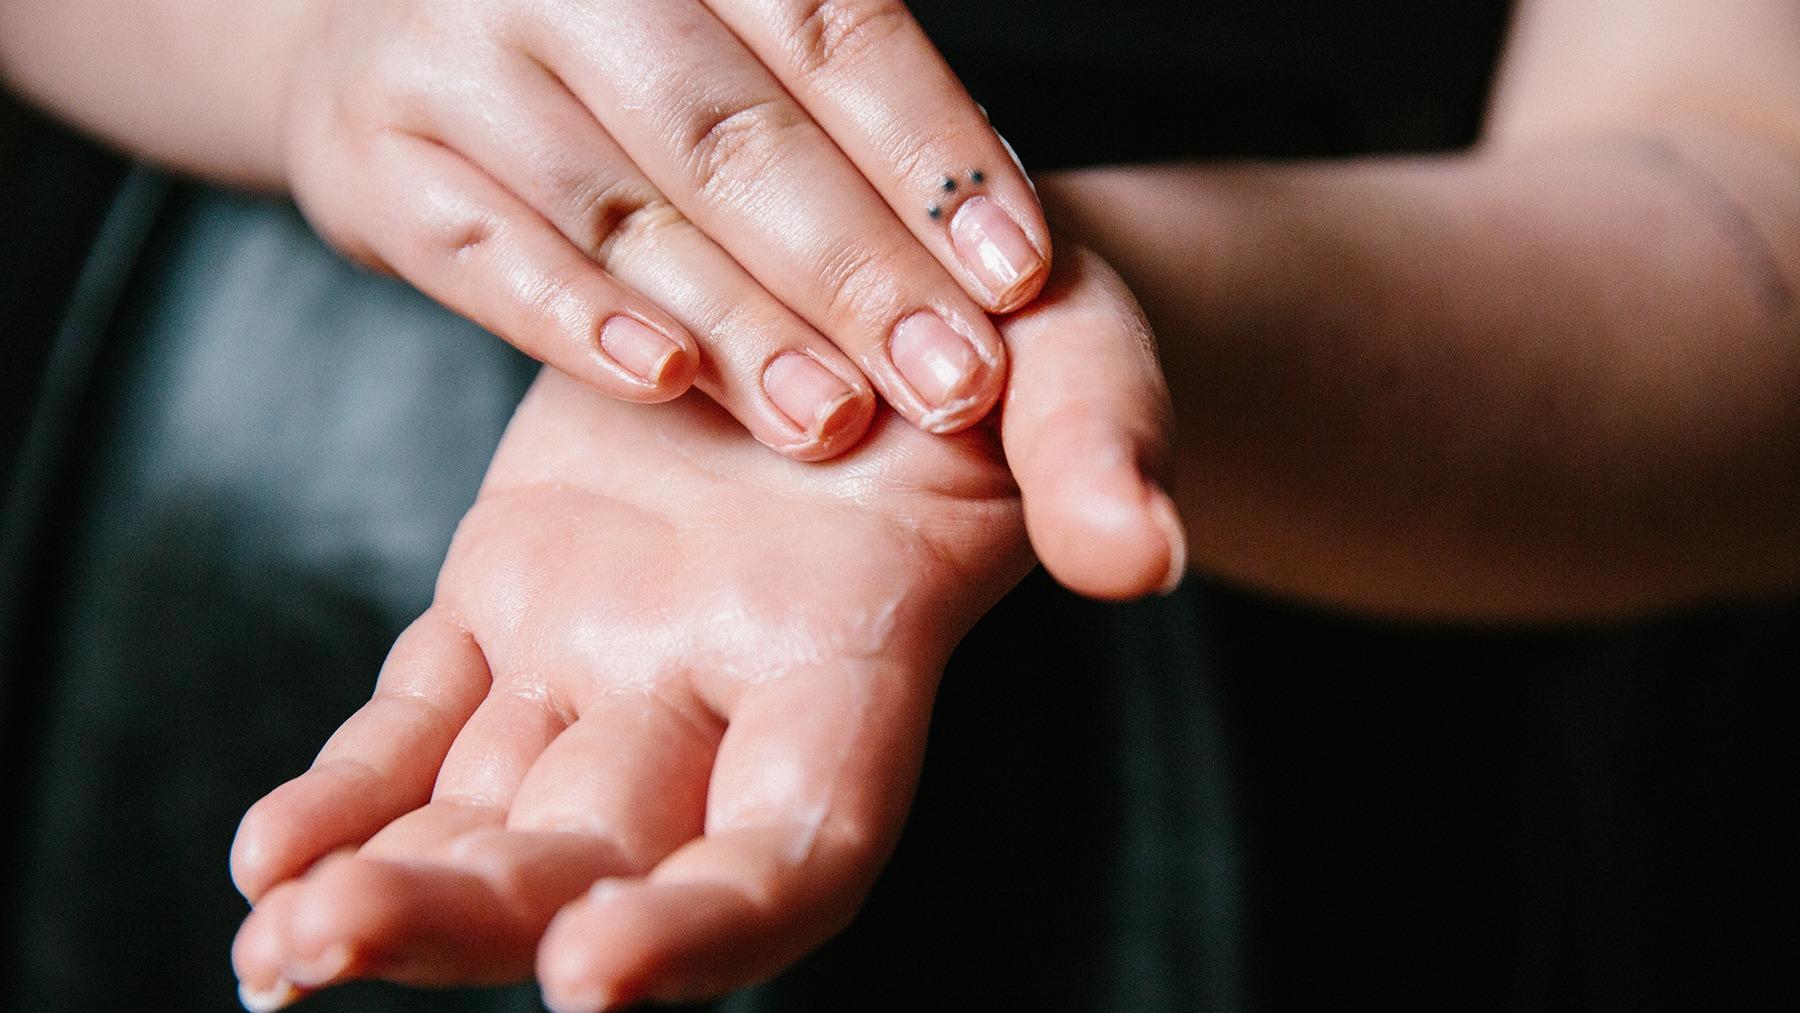 Helping Hands (Mani-Ah!) Crema per le mani Lush